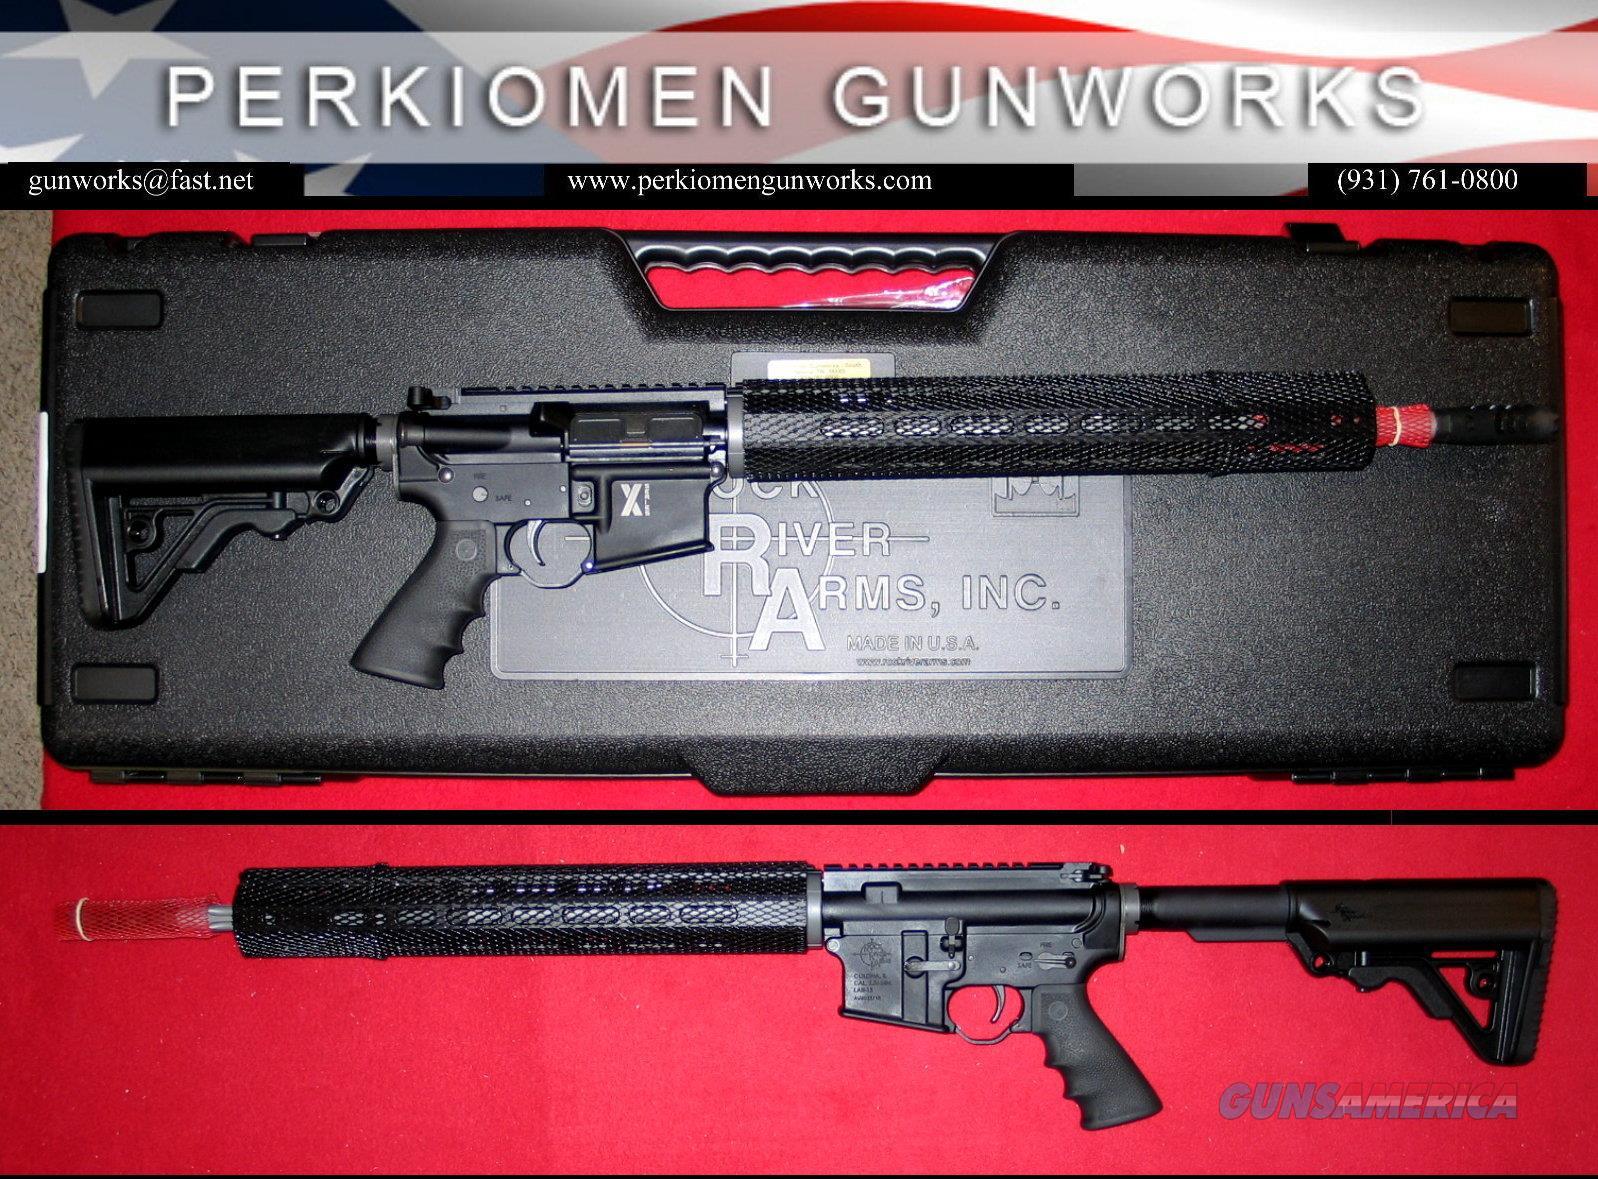 X-1, LAR-15 Rifle, 5.56/.223, 18 inch with Operator CAR 6-pos stock, New in Box, RRA # XAR1751B.  Guns > Rifles > Rock River Arms Rifles